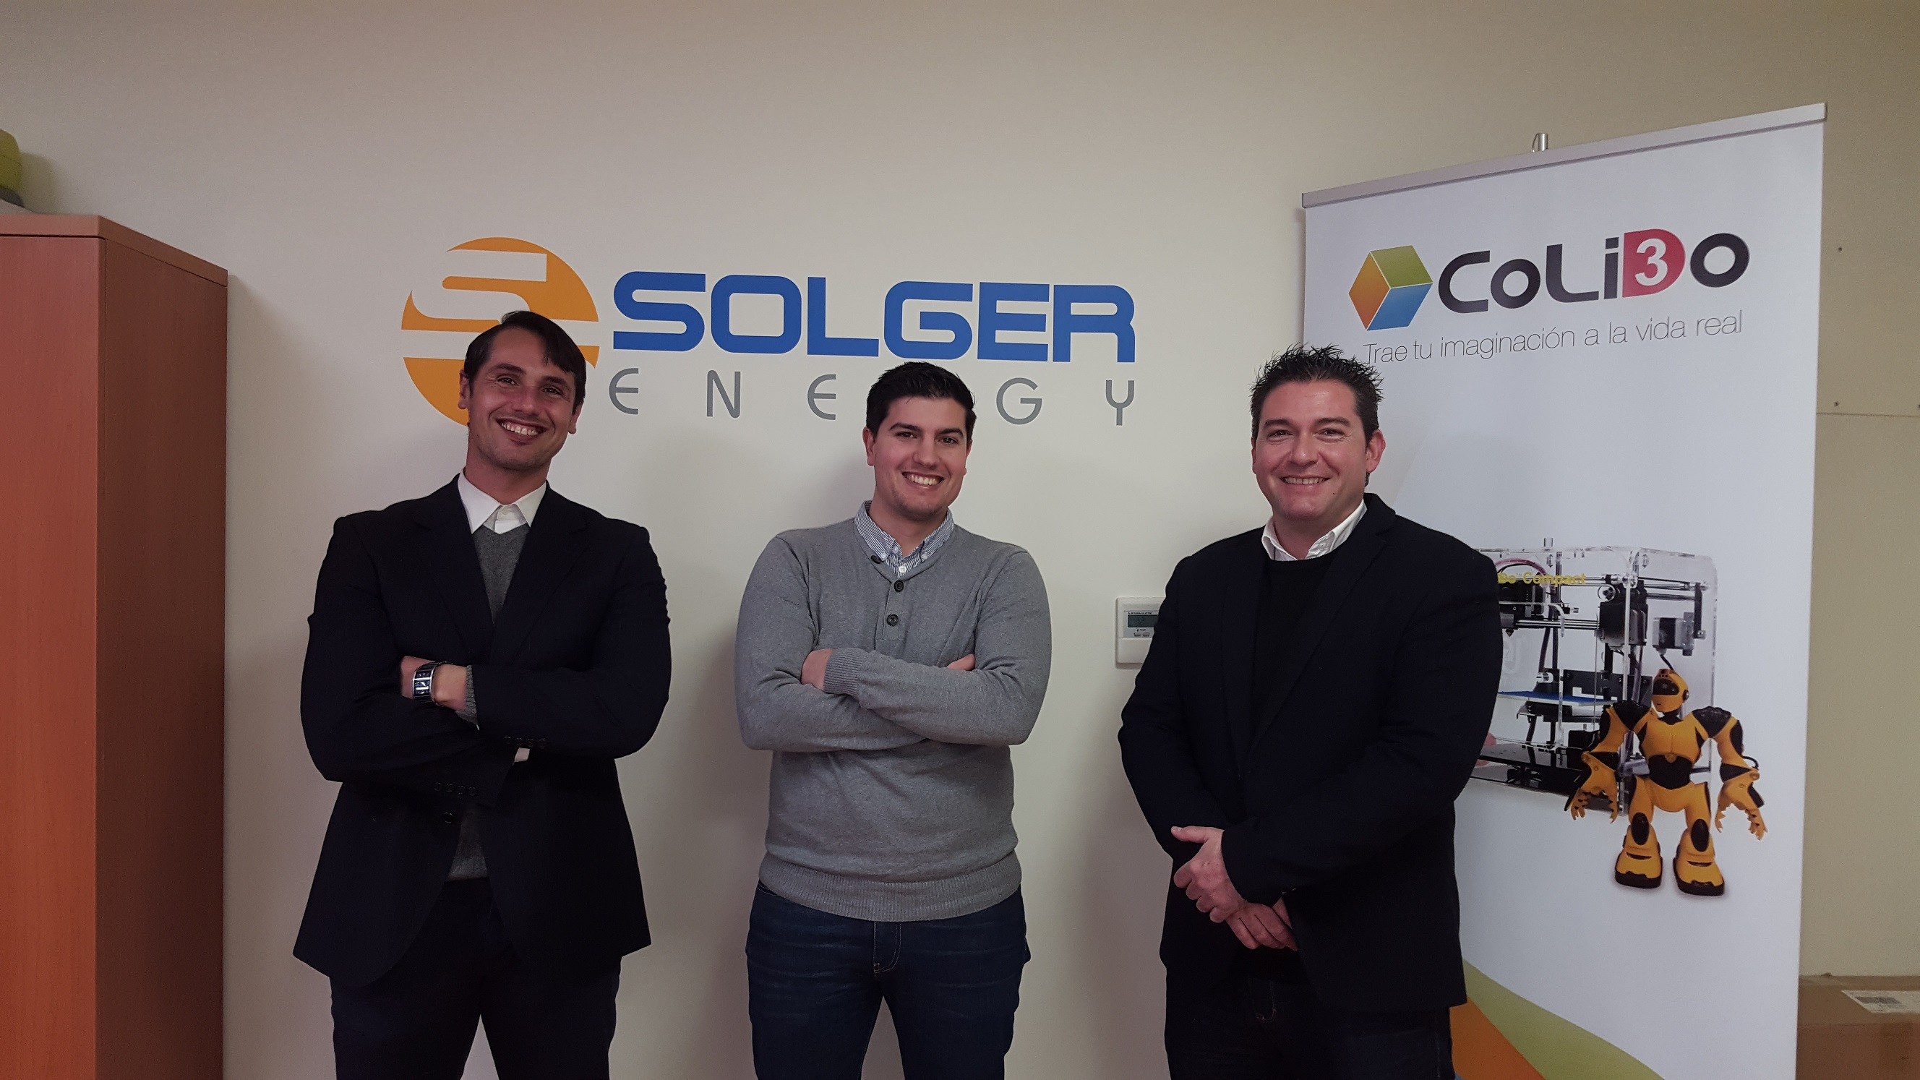 Impresión 3d En Valencia - Solger Energy - Colido.es